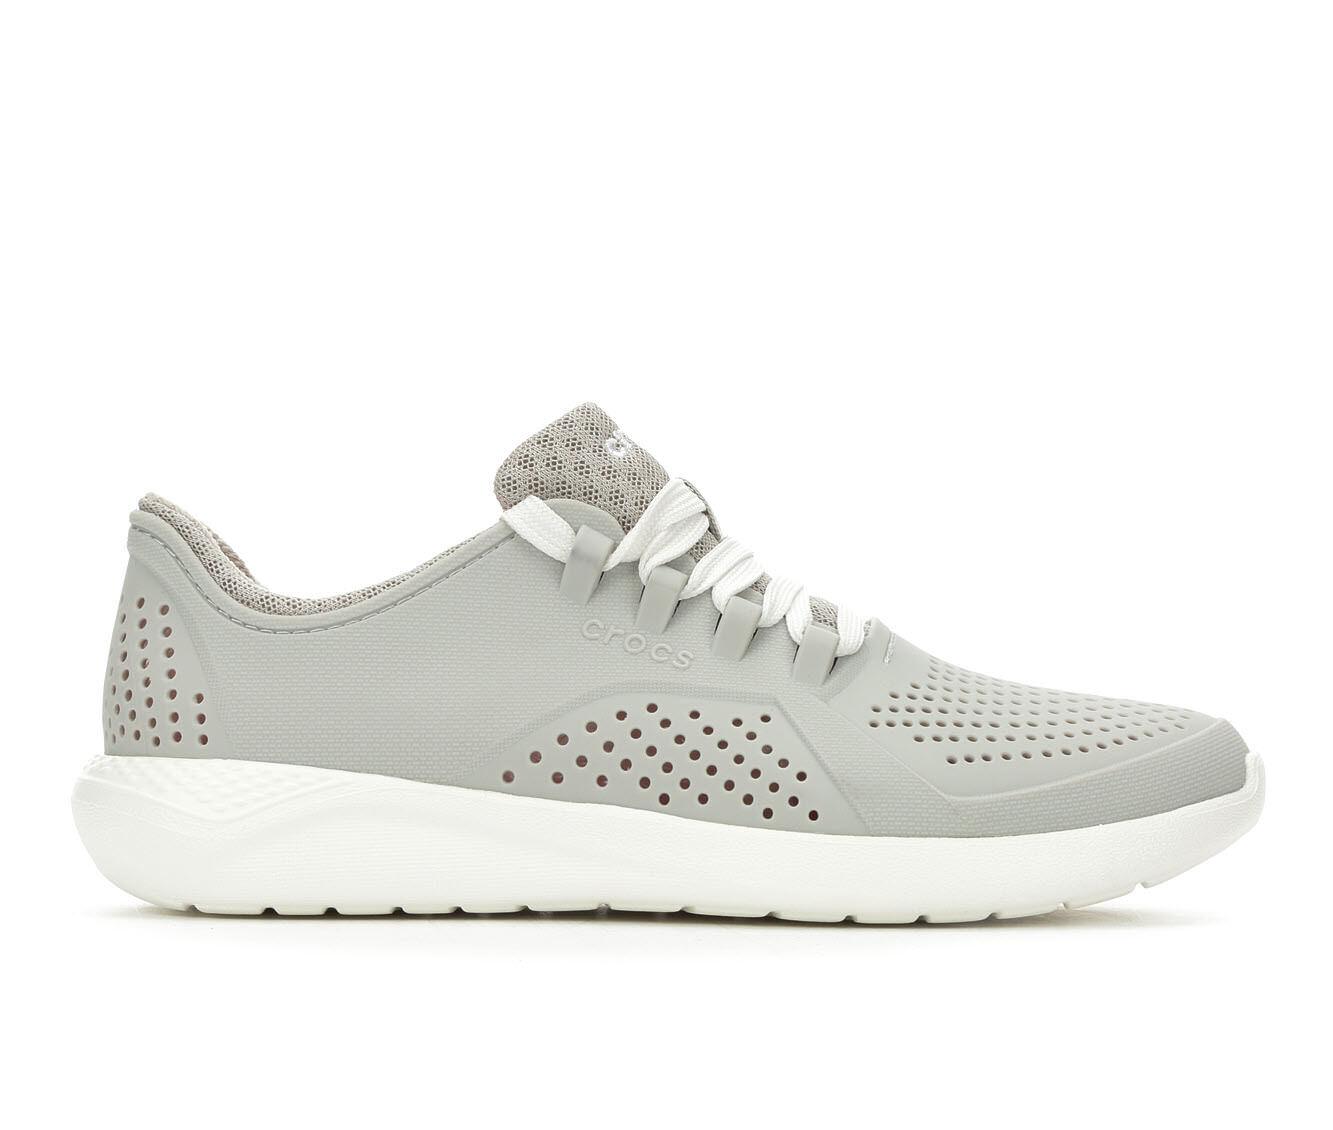 uk shoes_kd4639